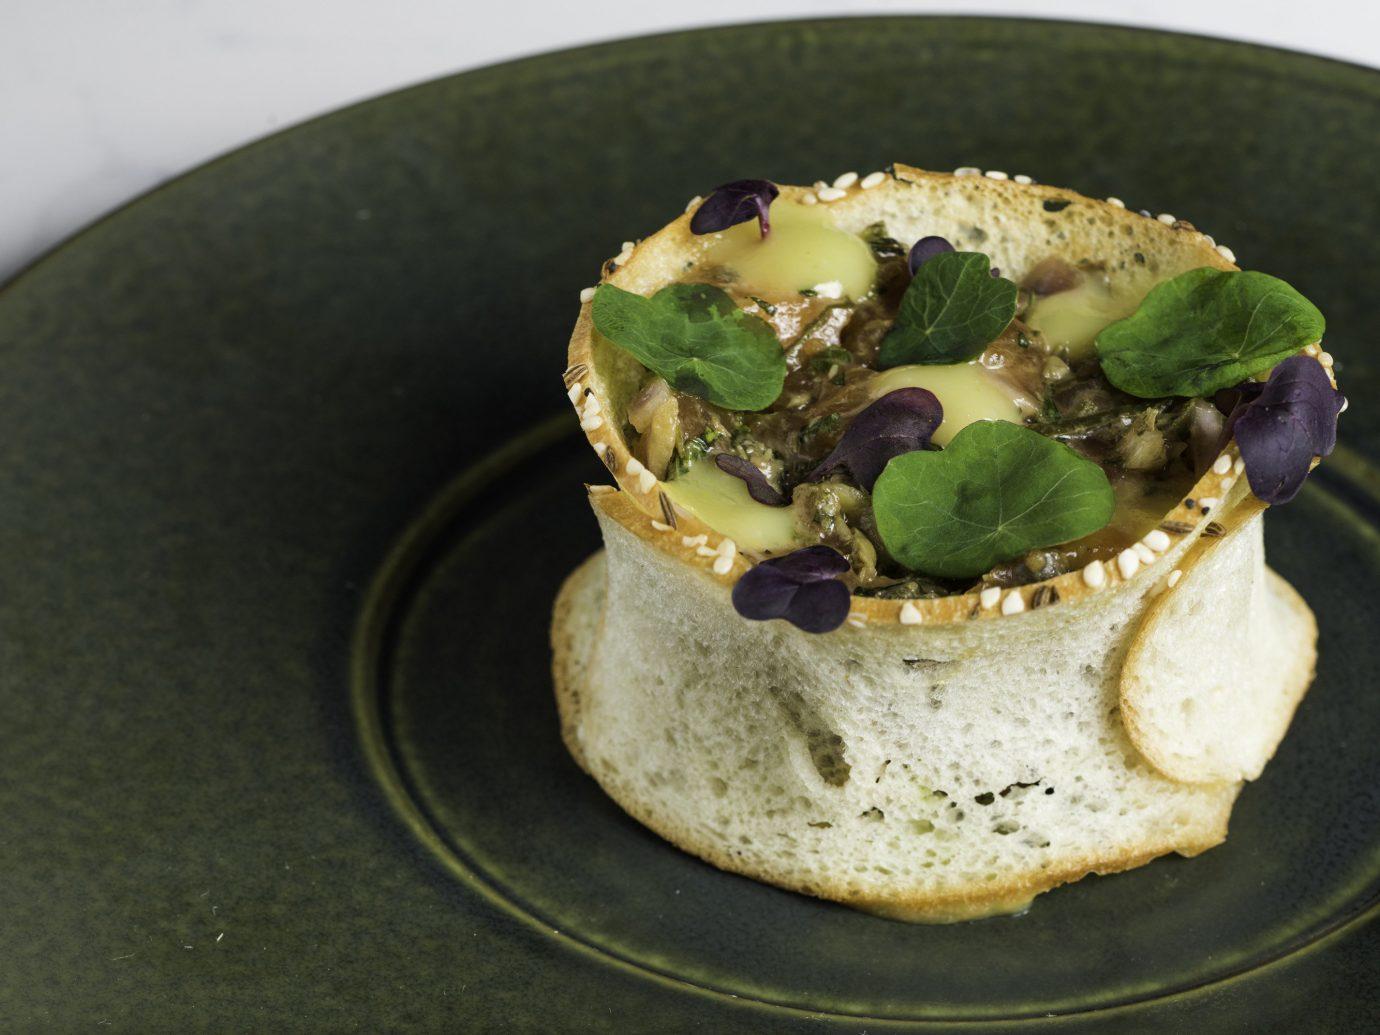 Food + Drink plate food dish dessert produce meal breakfast cuisine slice snack food